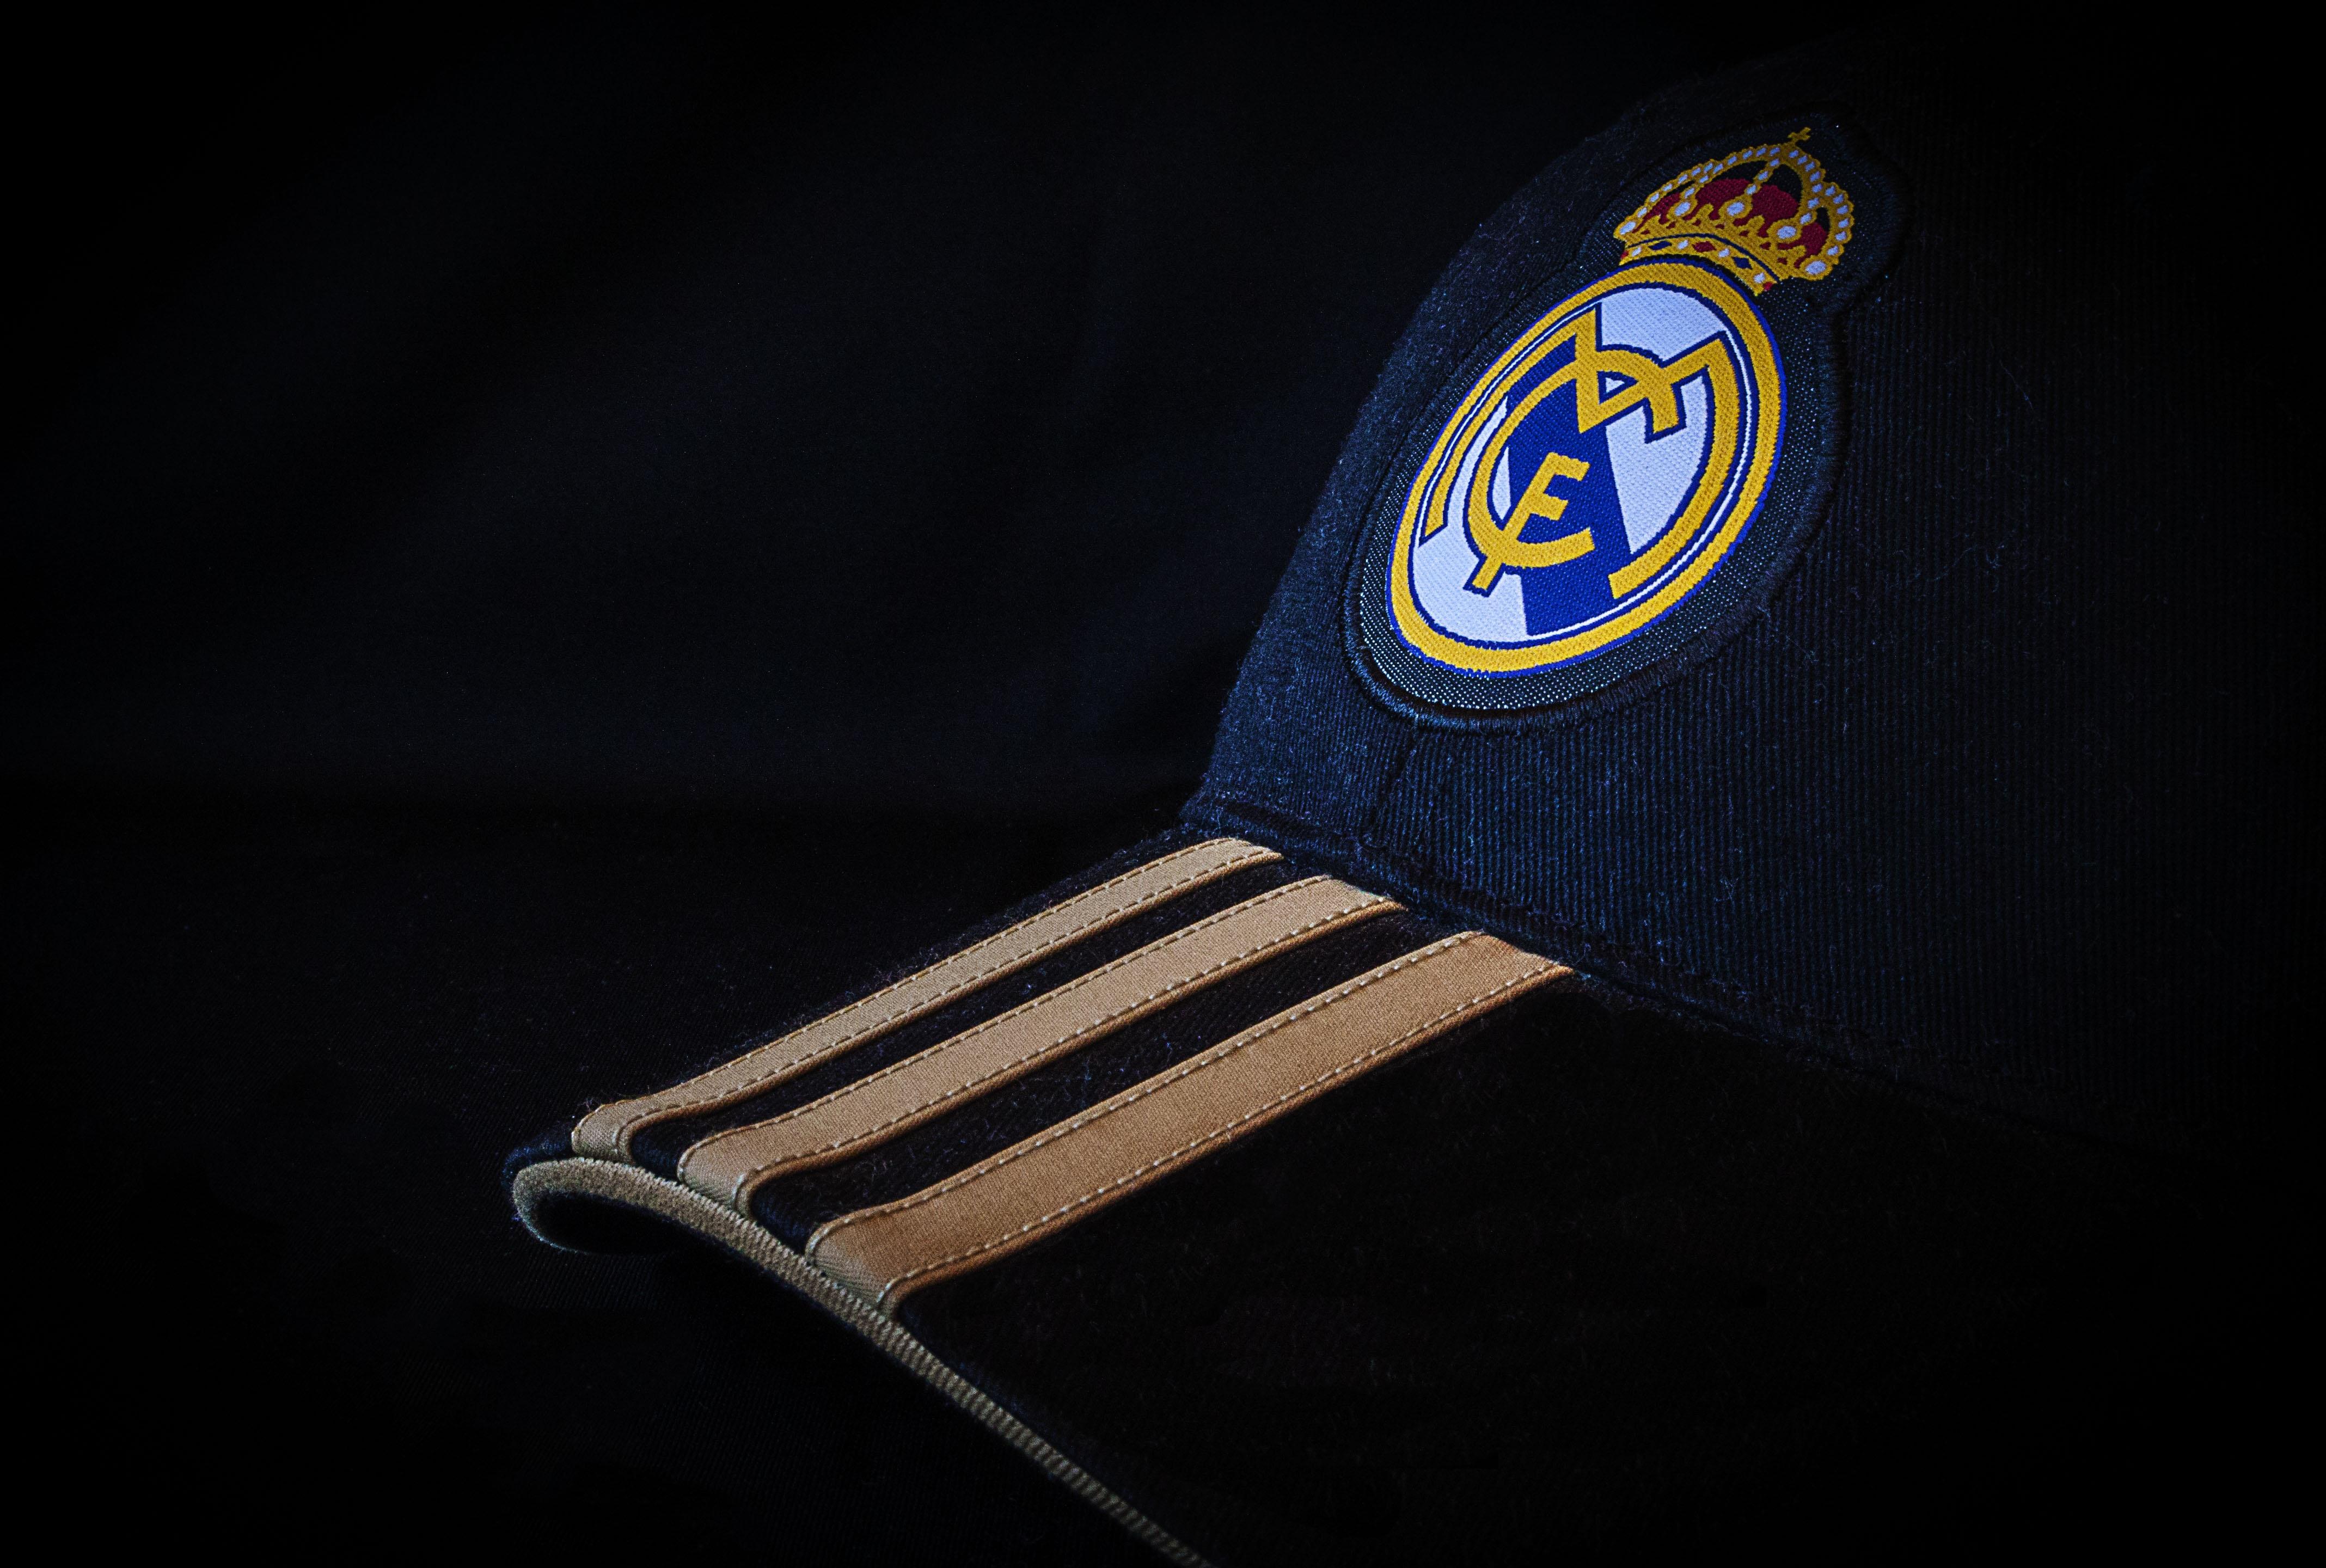 Fotos gratis sombrero azul ropa marca espaa gorra campen sombrero azul ropa marca espaa gorra campen escudo de armas real madrid altavistaventures Choice Image